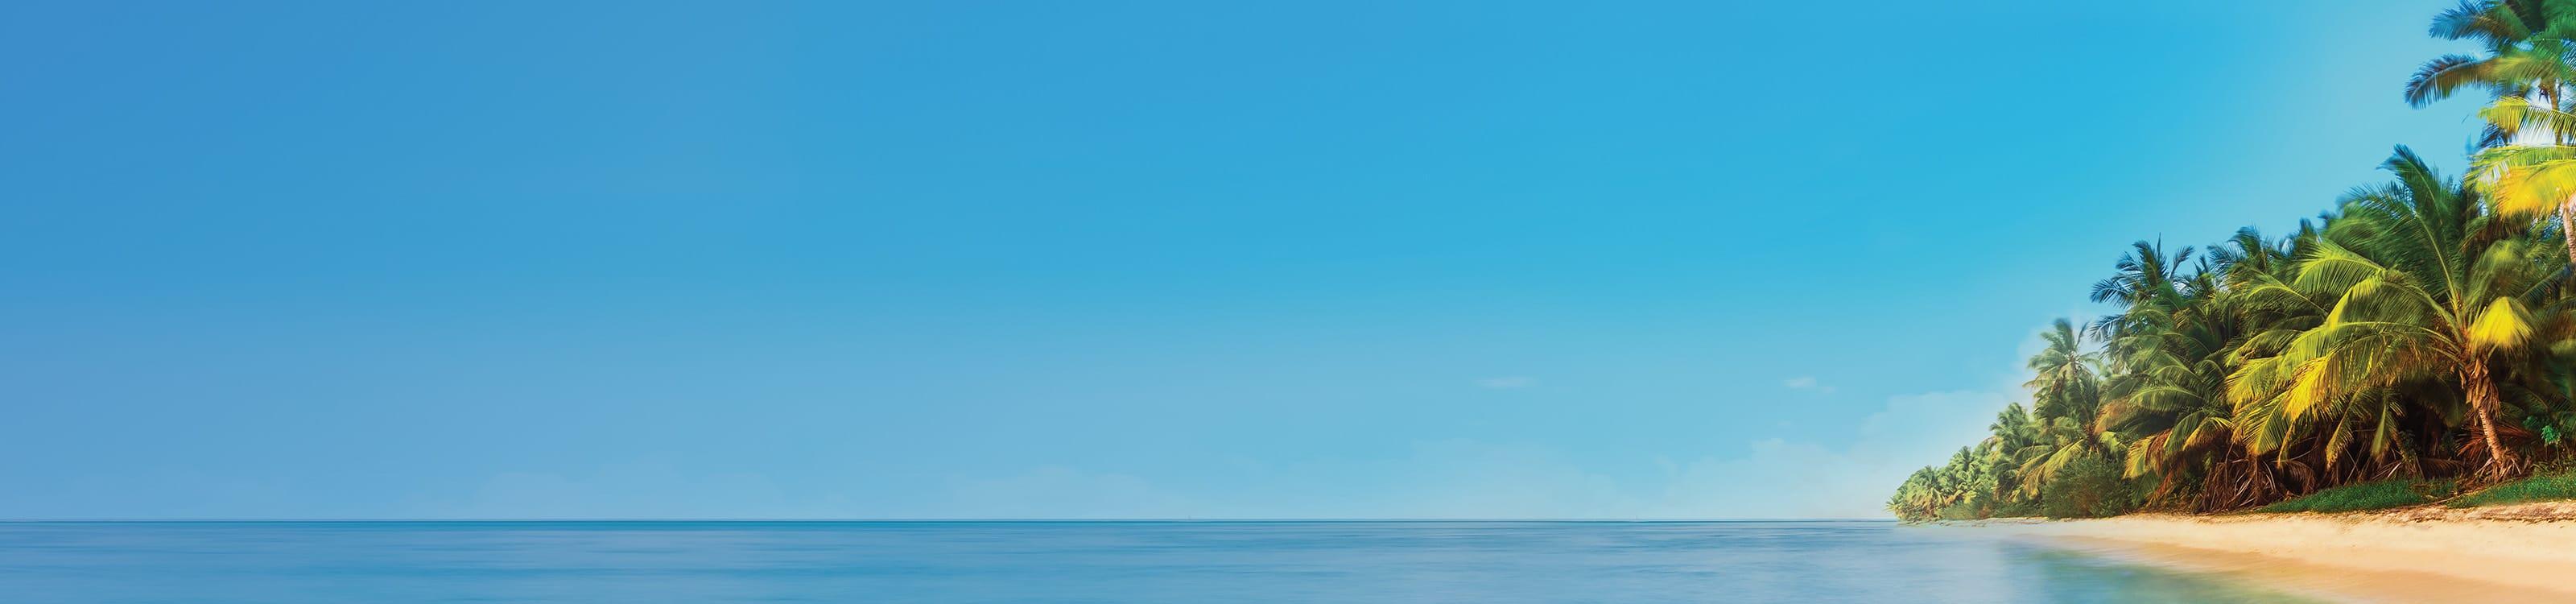 Norwegian's Free at Sea | Cruzeiros & ofertas de cruzeiro